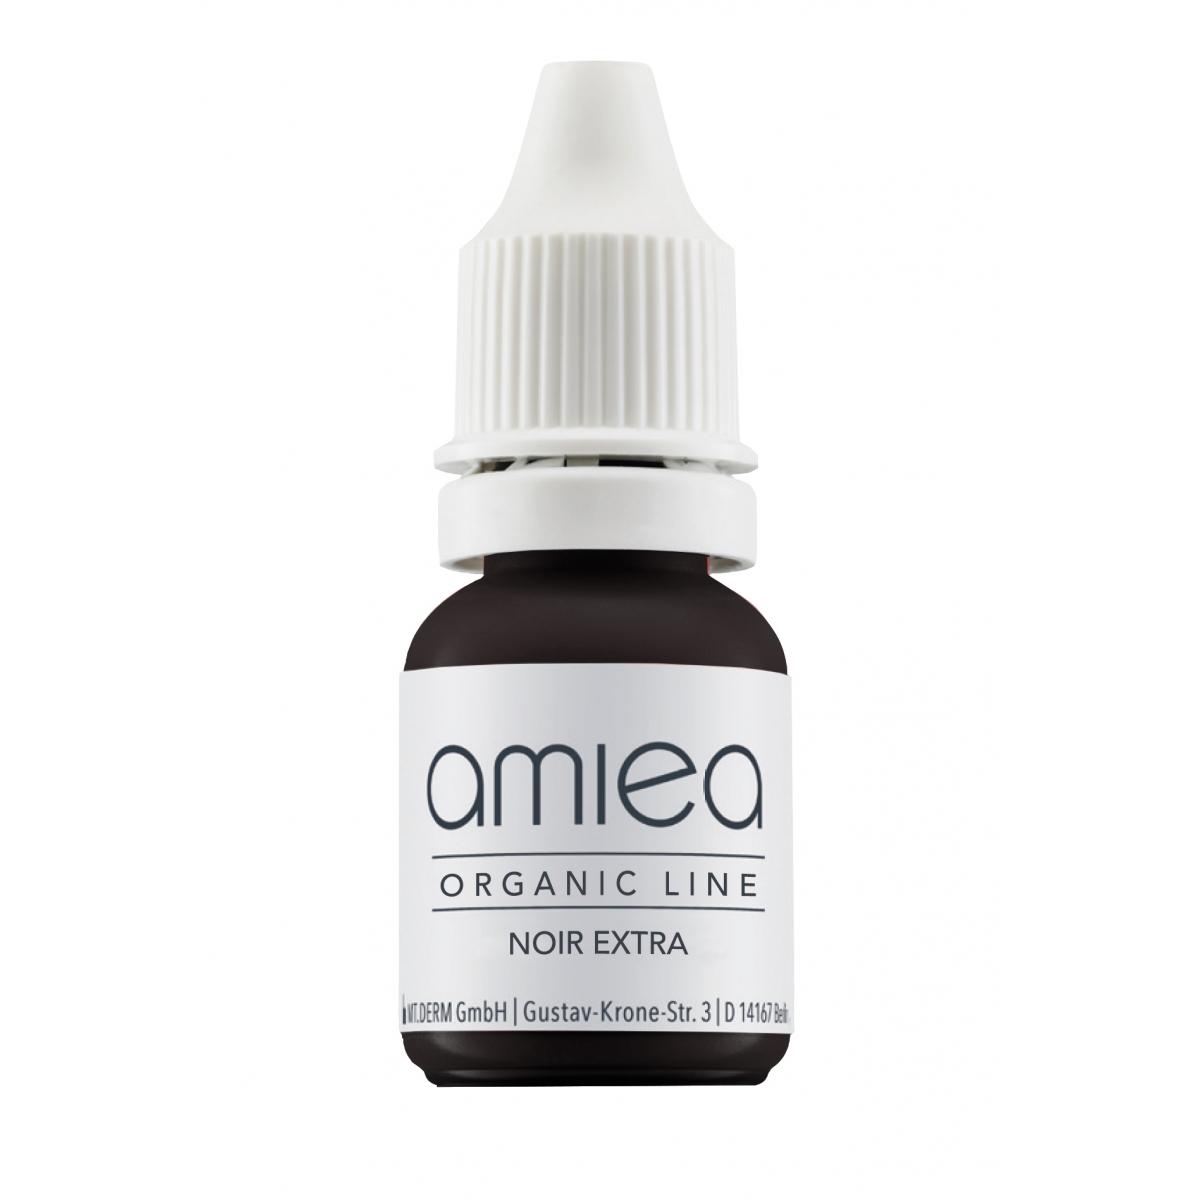 ORGANIC LINE (5ml)  - PIGMENT NOIR EXTRA ORGANICLINE AMIEA (5 ml)